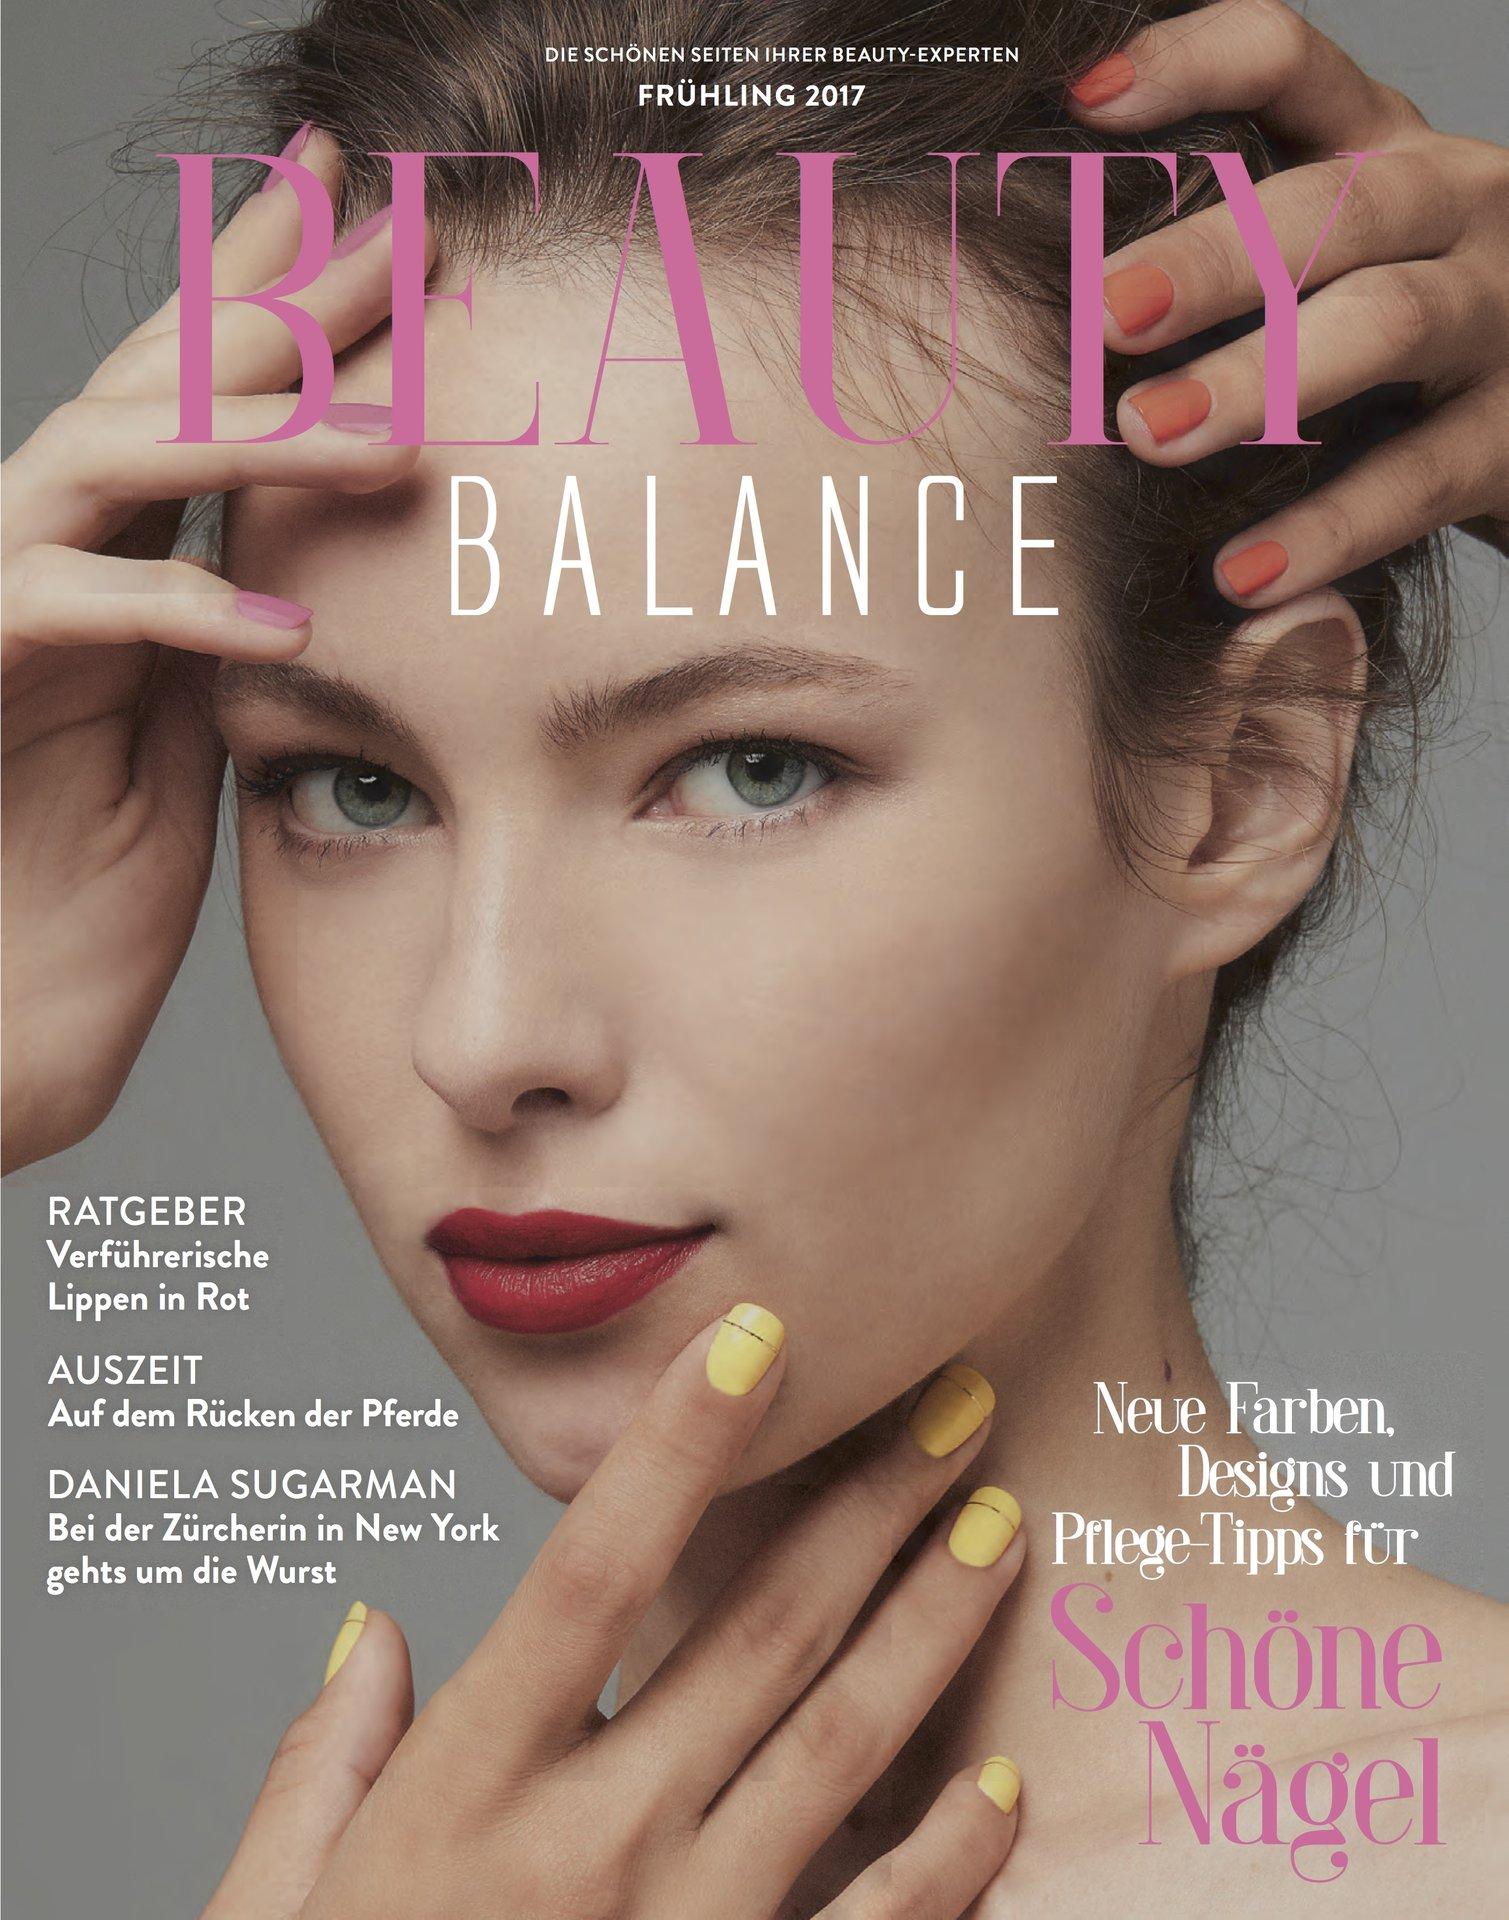 ALESSANDRO I Nails: Melanie Volkart & Fabienne A. Pauli Makeup: Nicola Fischer Model: Victoria @ Scout Model Agency Photographer: Karin Heer